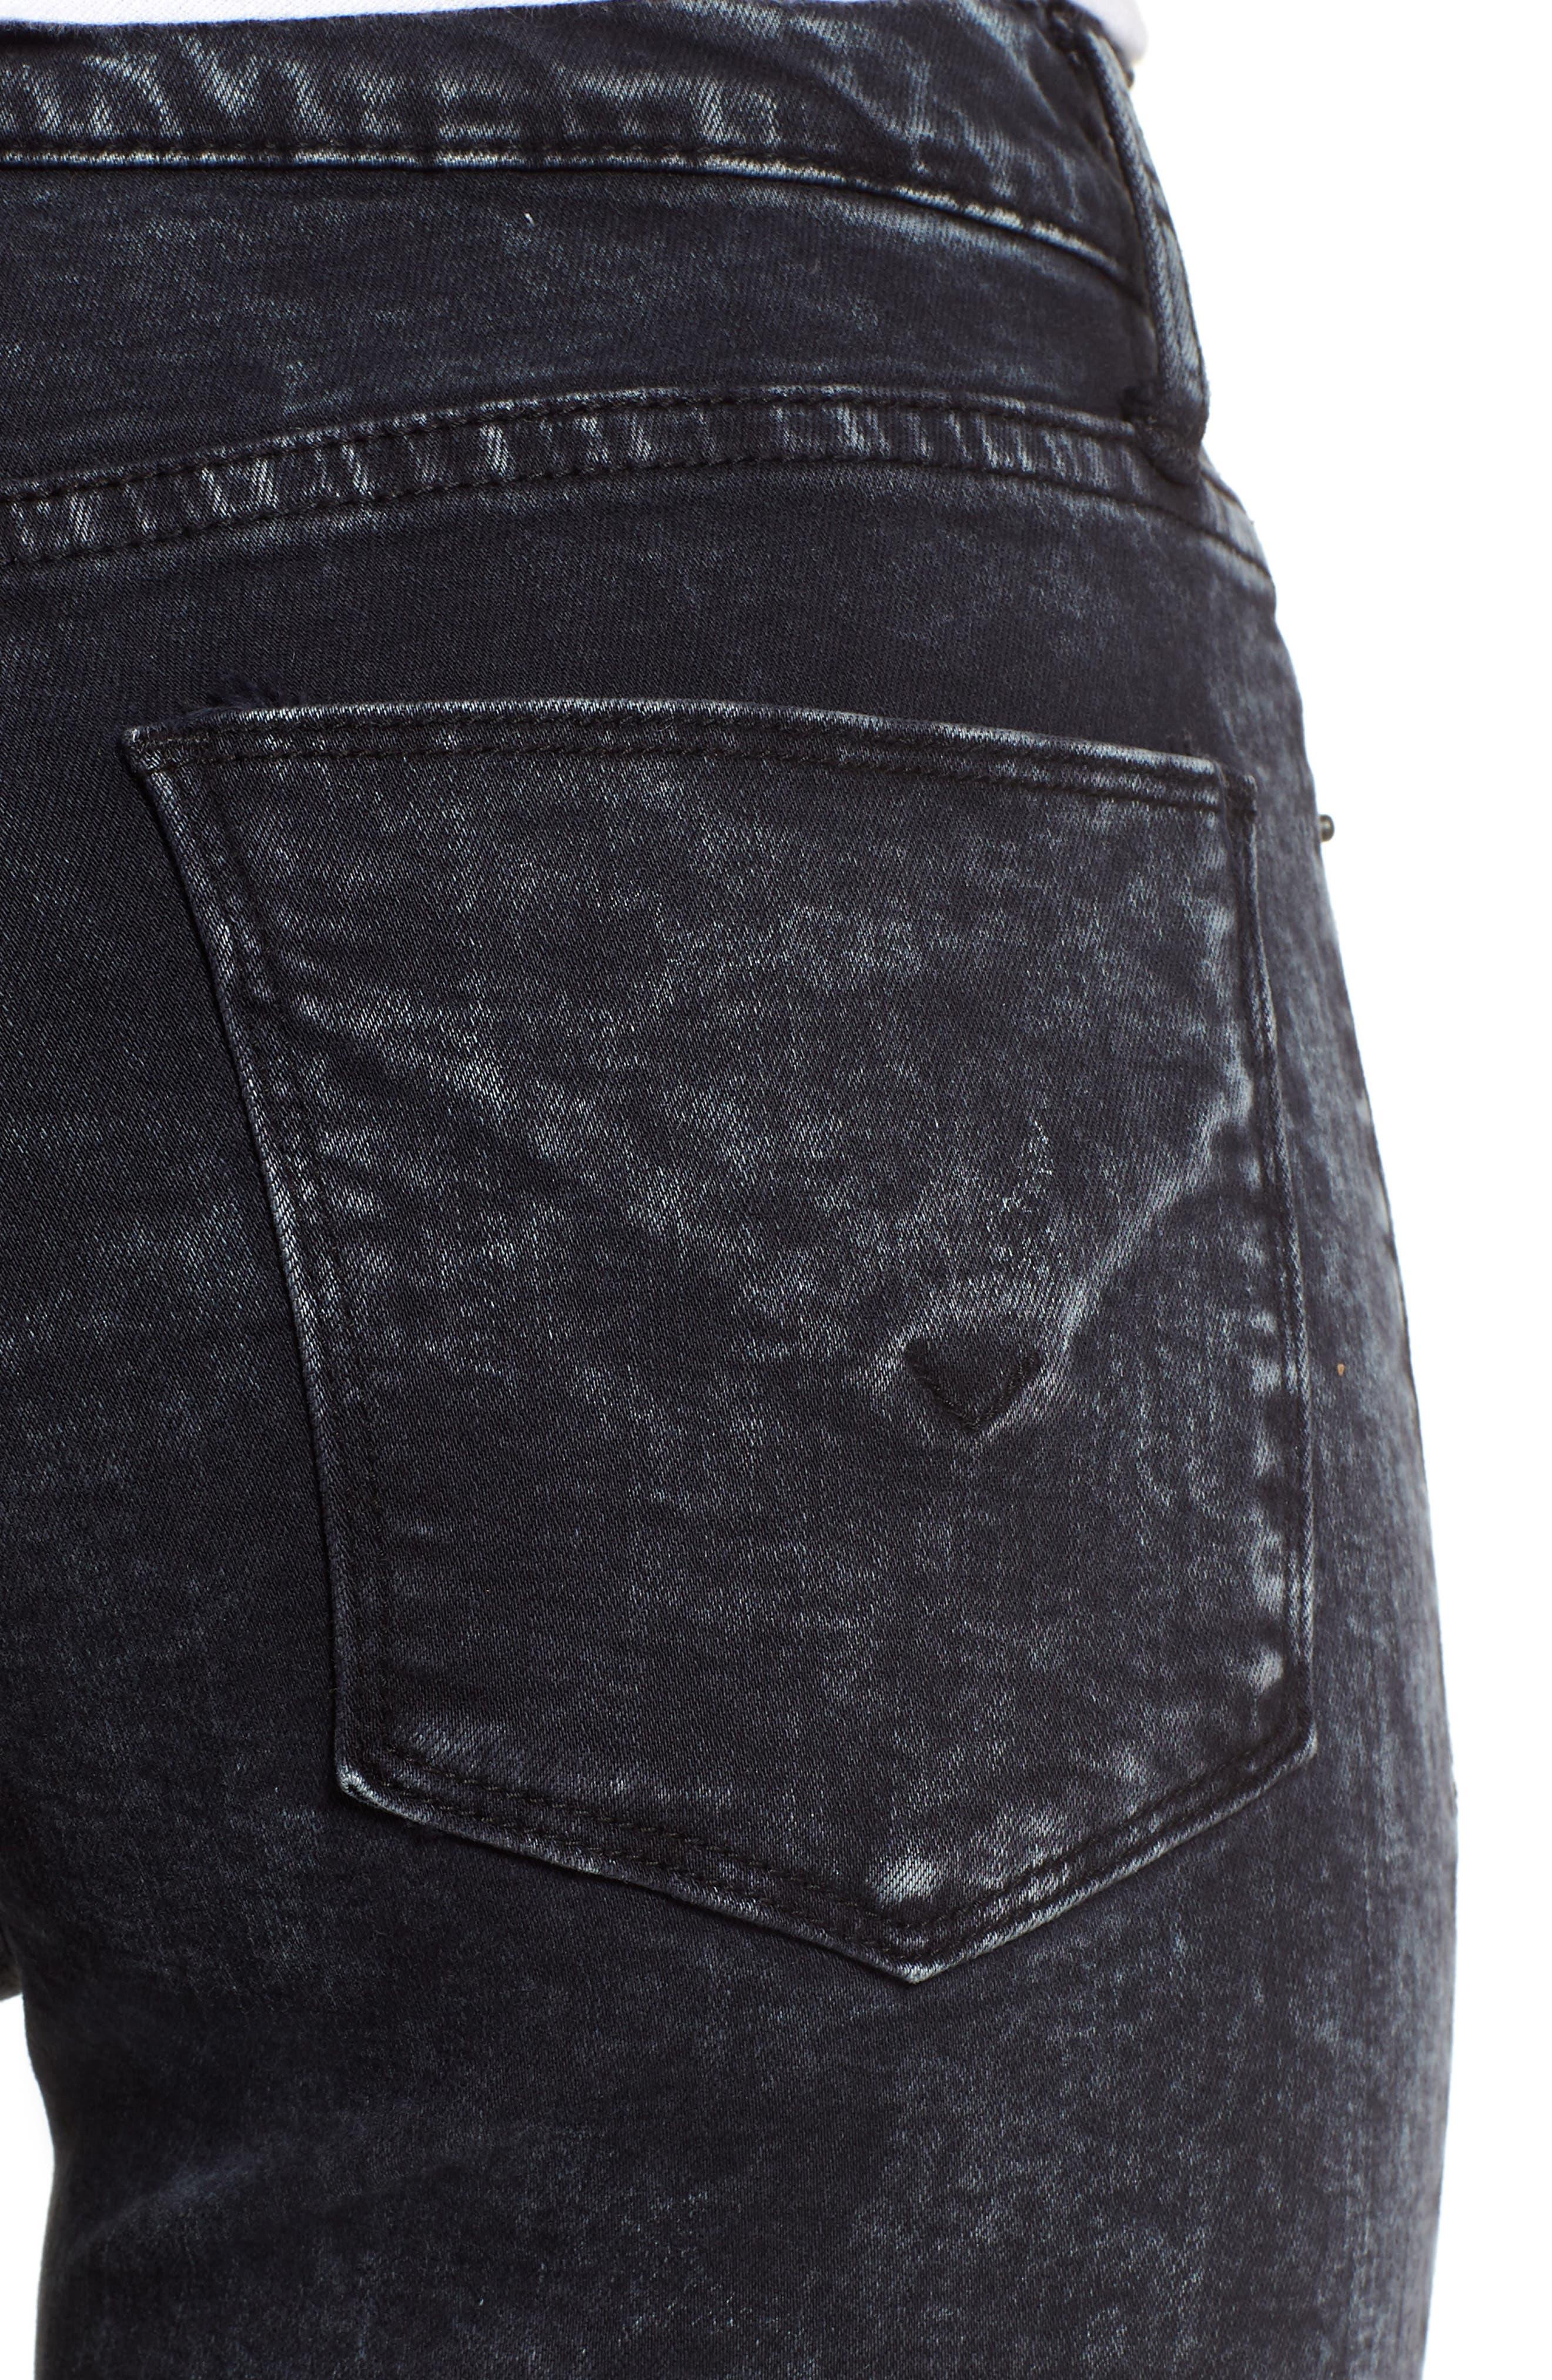 Barbara High Waist Ankle Skinny Jeans,                             Alternate thumbnail 4, color,                             Dainty